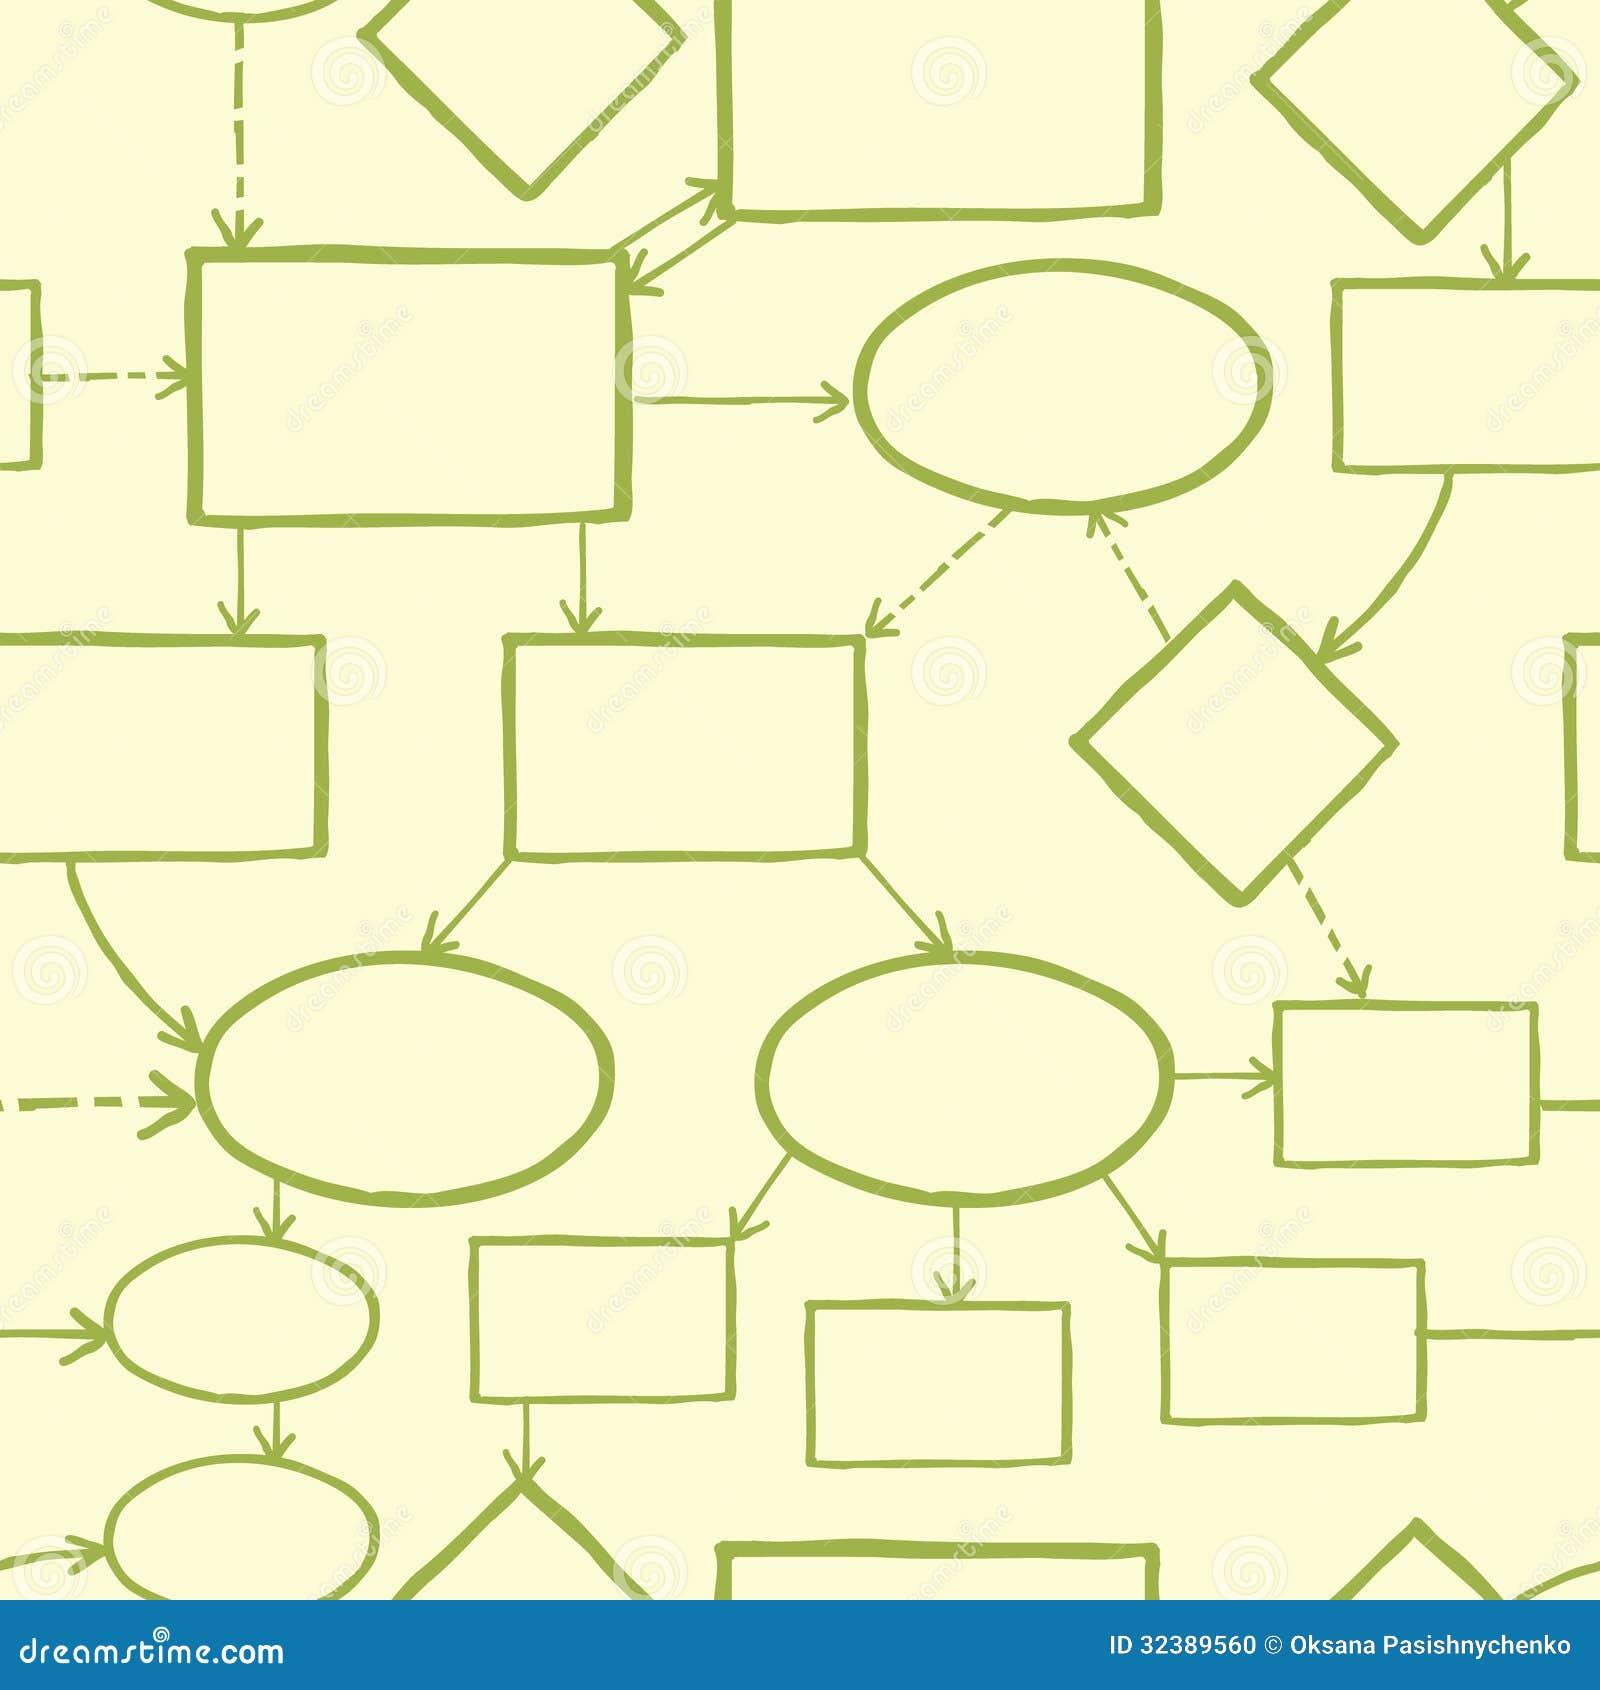 Blank Brainstorming Web Blank mind map seamless